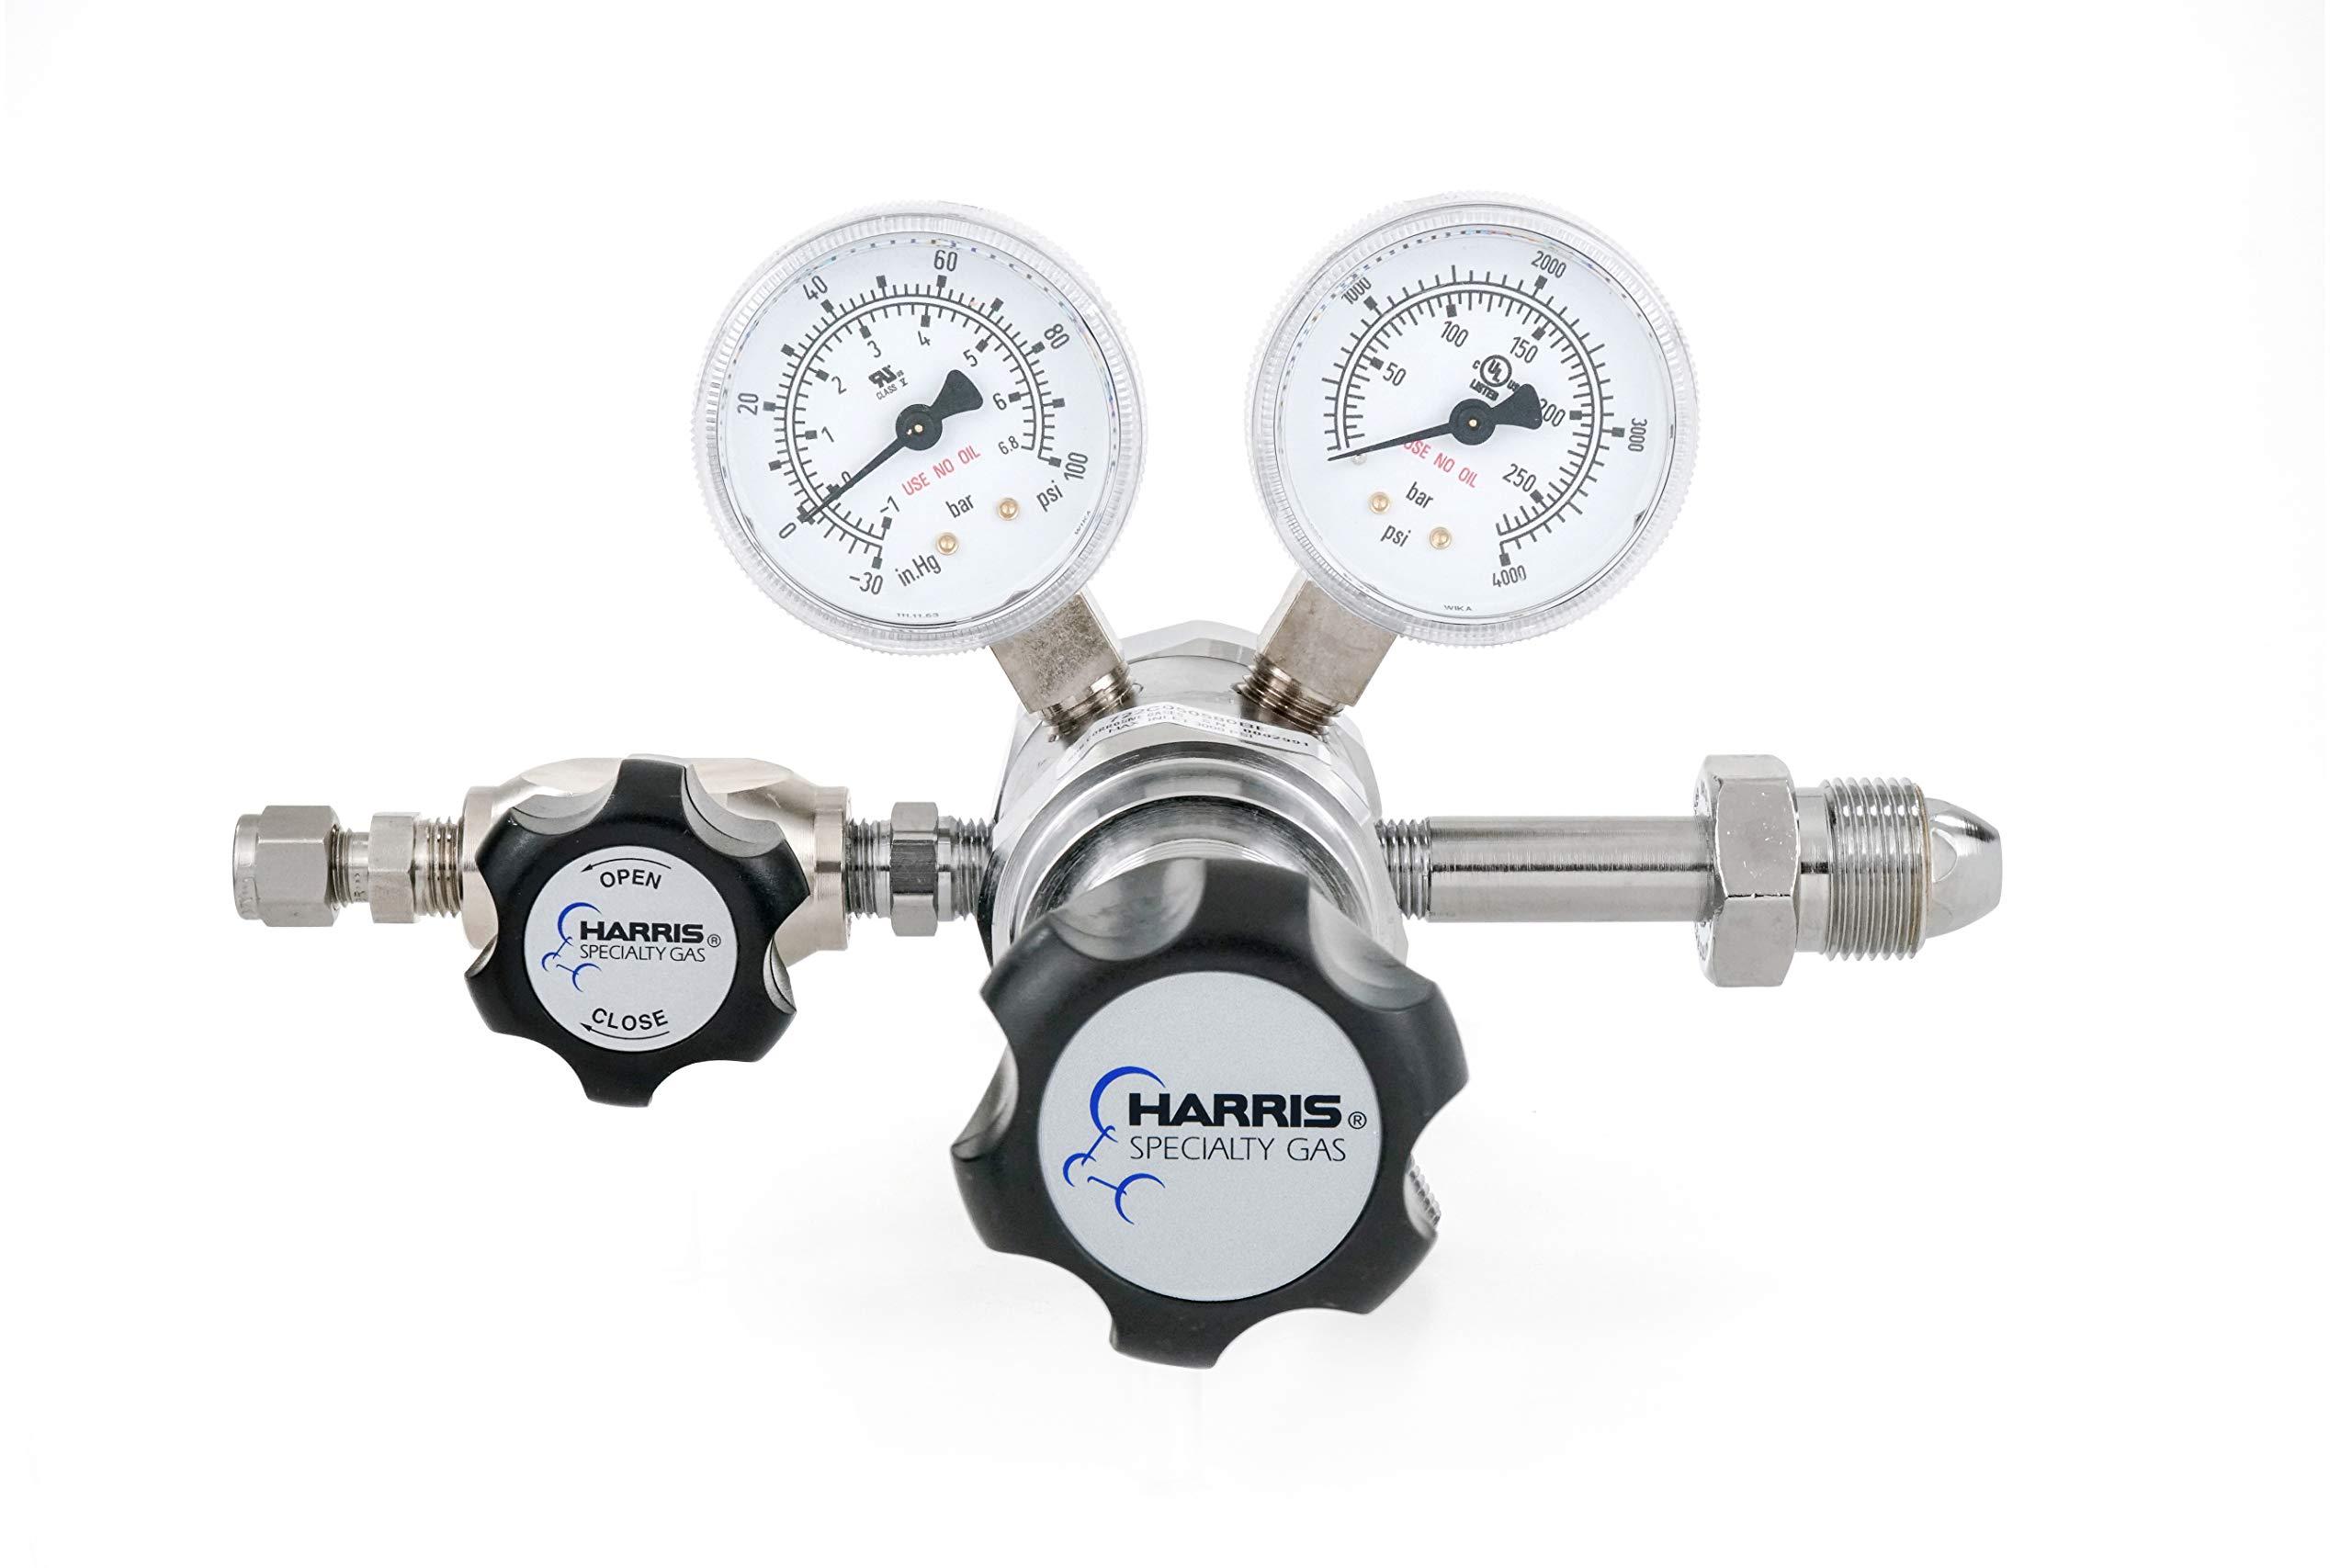 Nitrogen, Helium, Argon specialty gas lab regulator, CGA 580, 2-stage, chrome-plated, 0-50 PSI